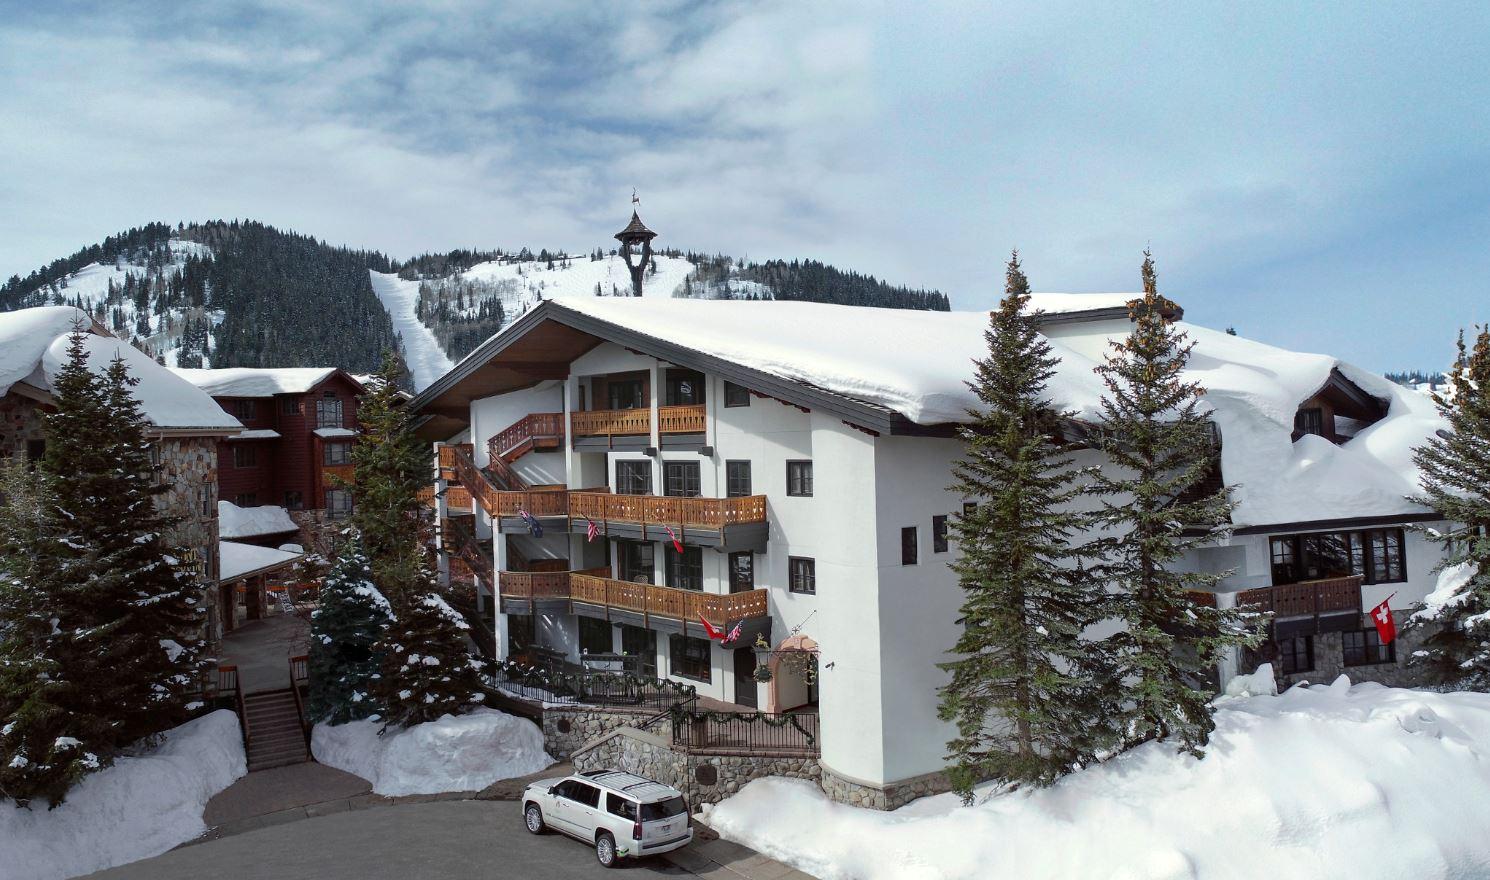 Goldener Hirsch Inn in Park City Utah at Deer Valley Resort